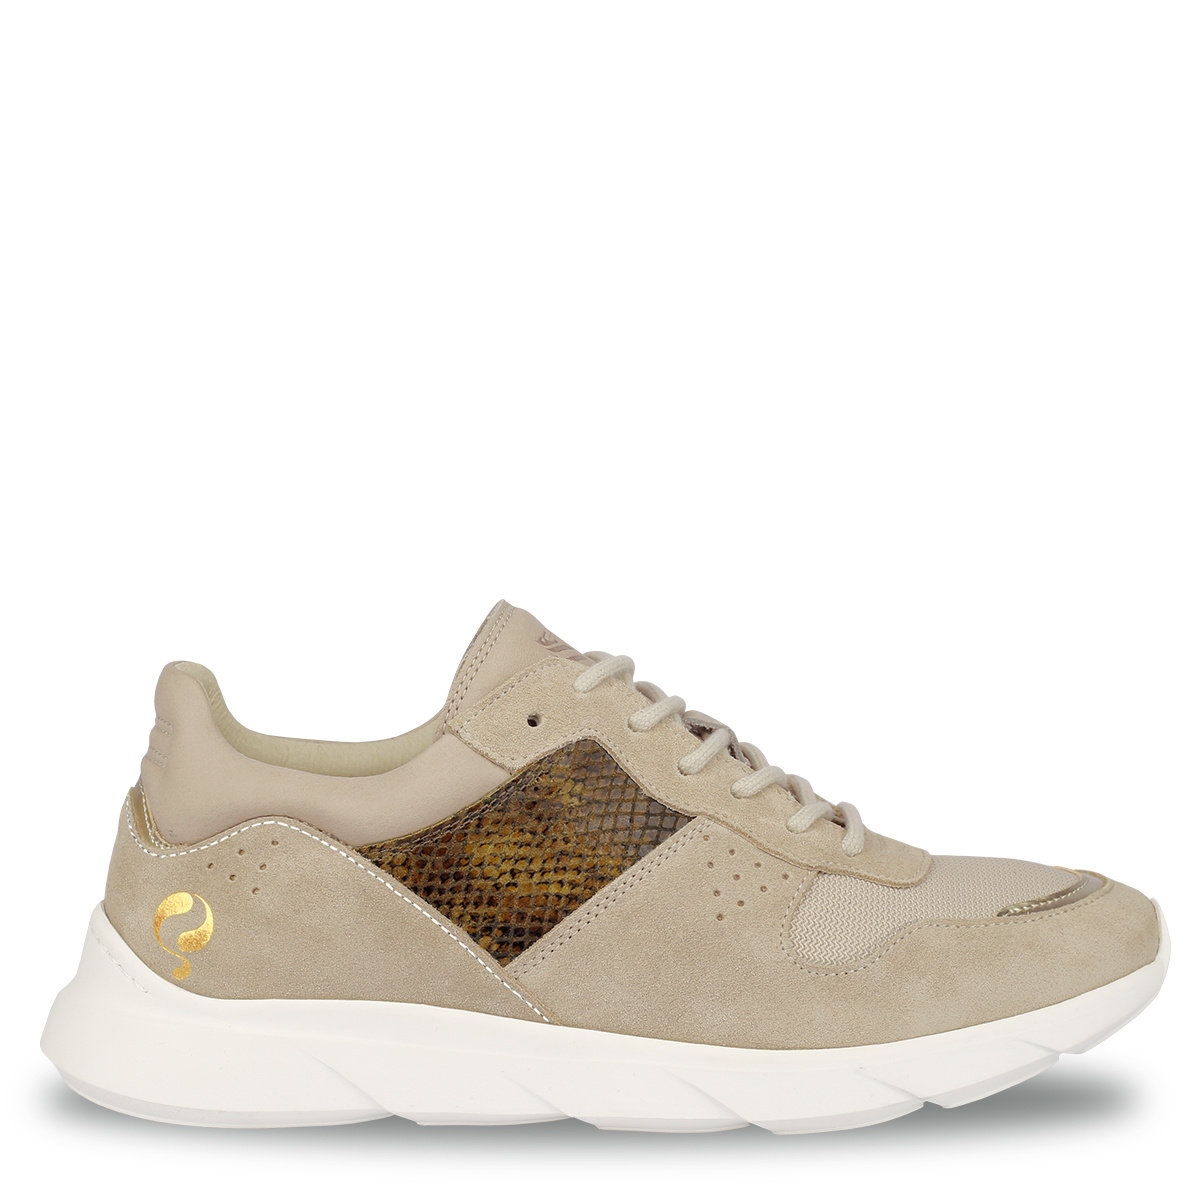 Dames Sneaker Hillegom - Zacht taupe